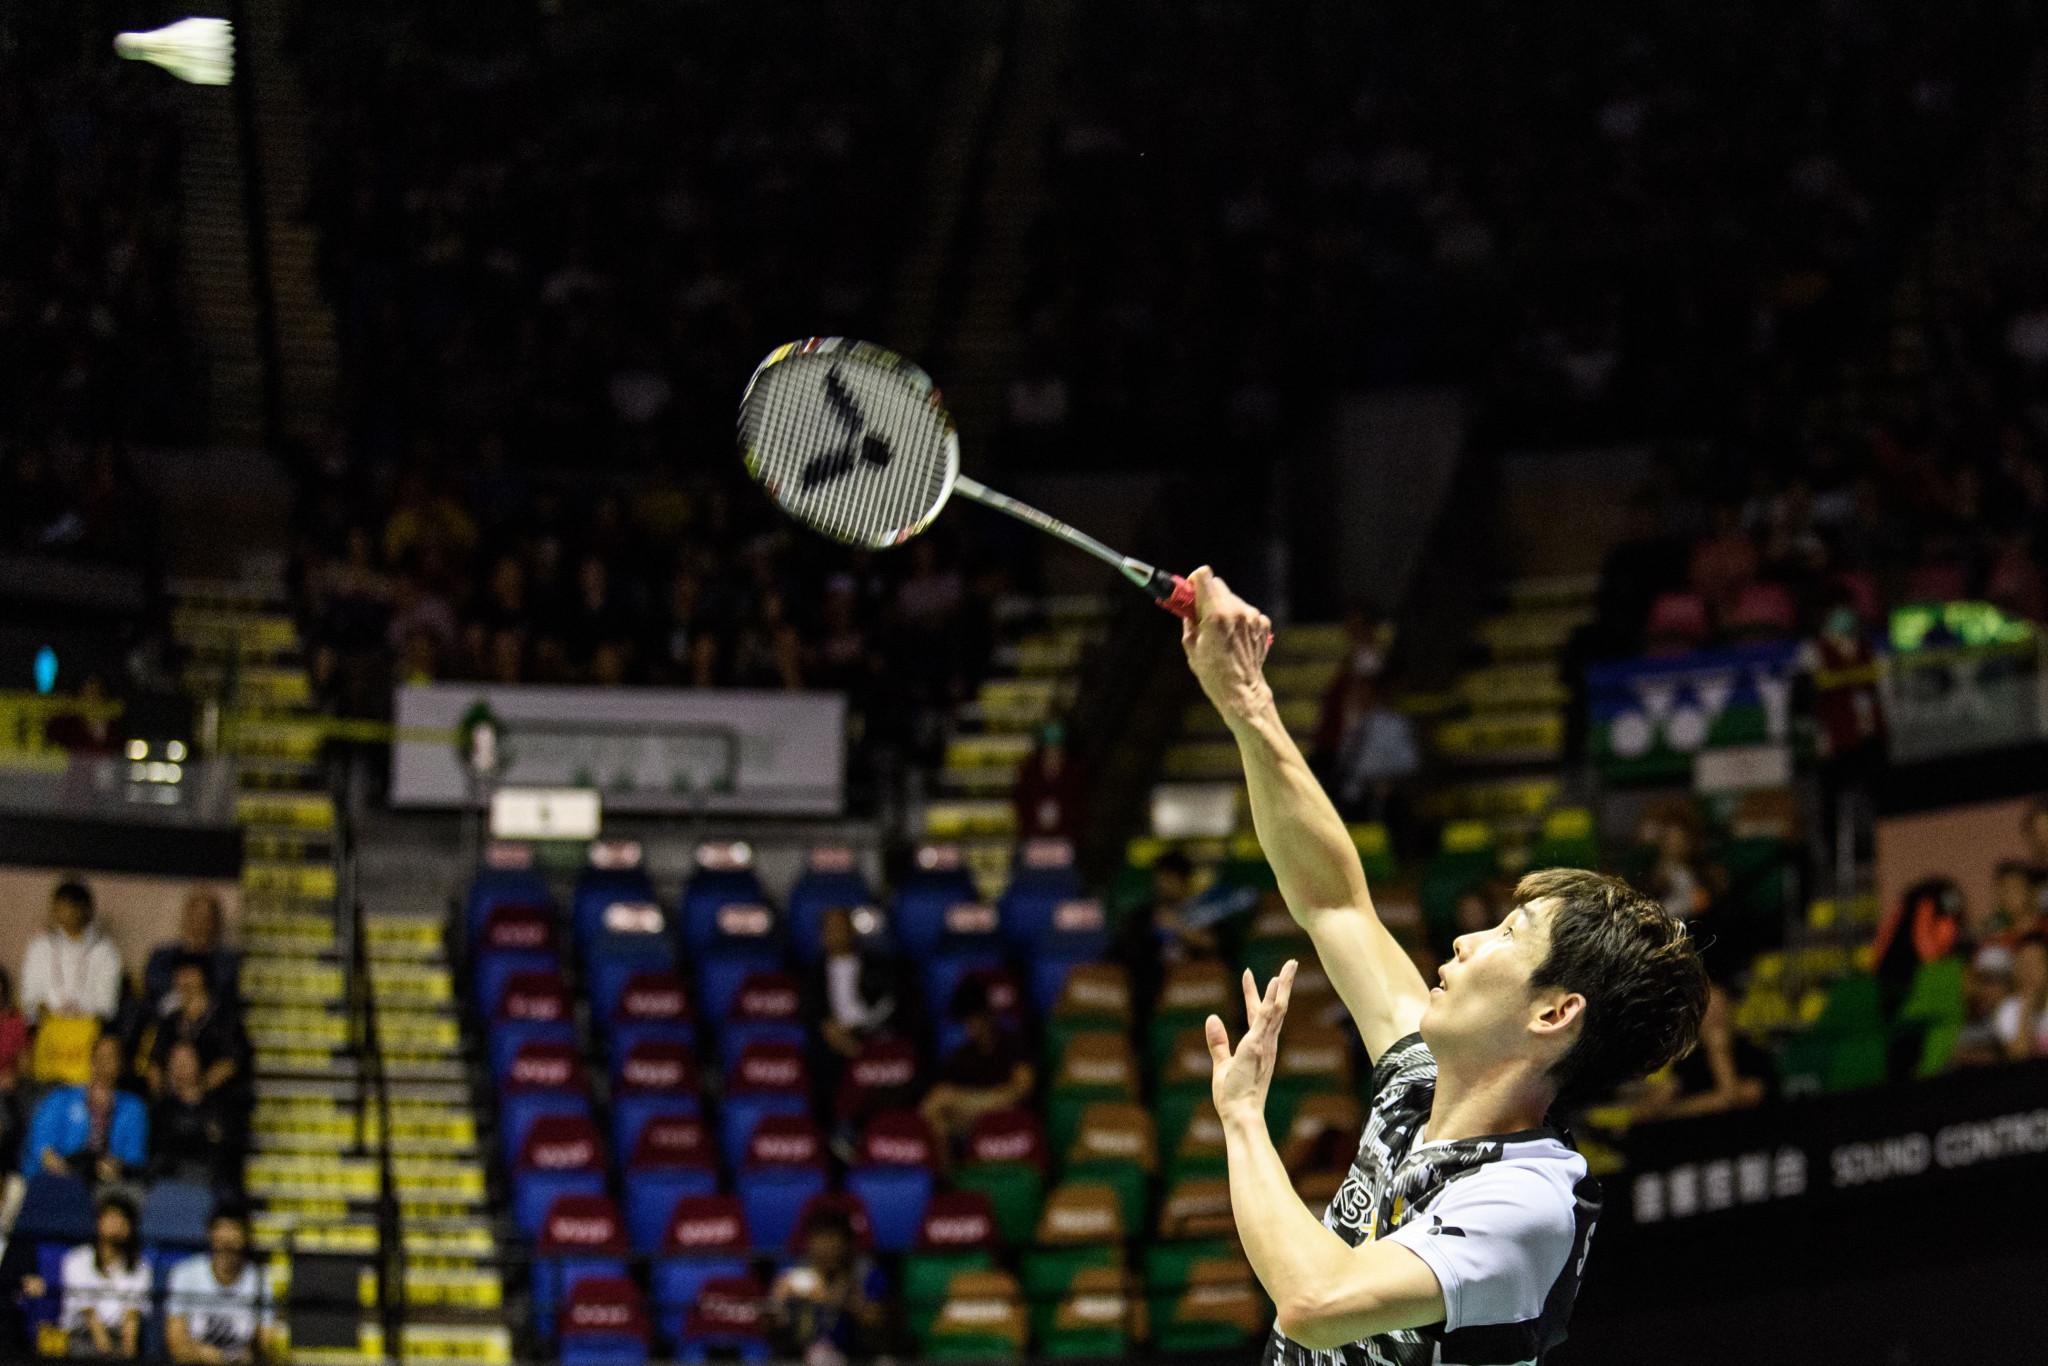 Home favourite Son through to BWF Korea Masters semi-finals